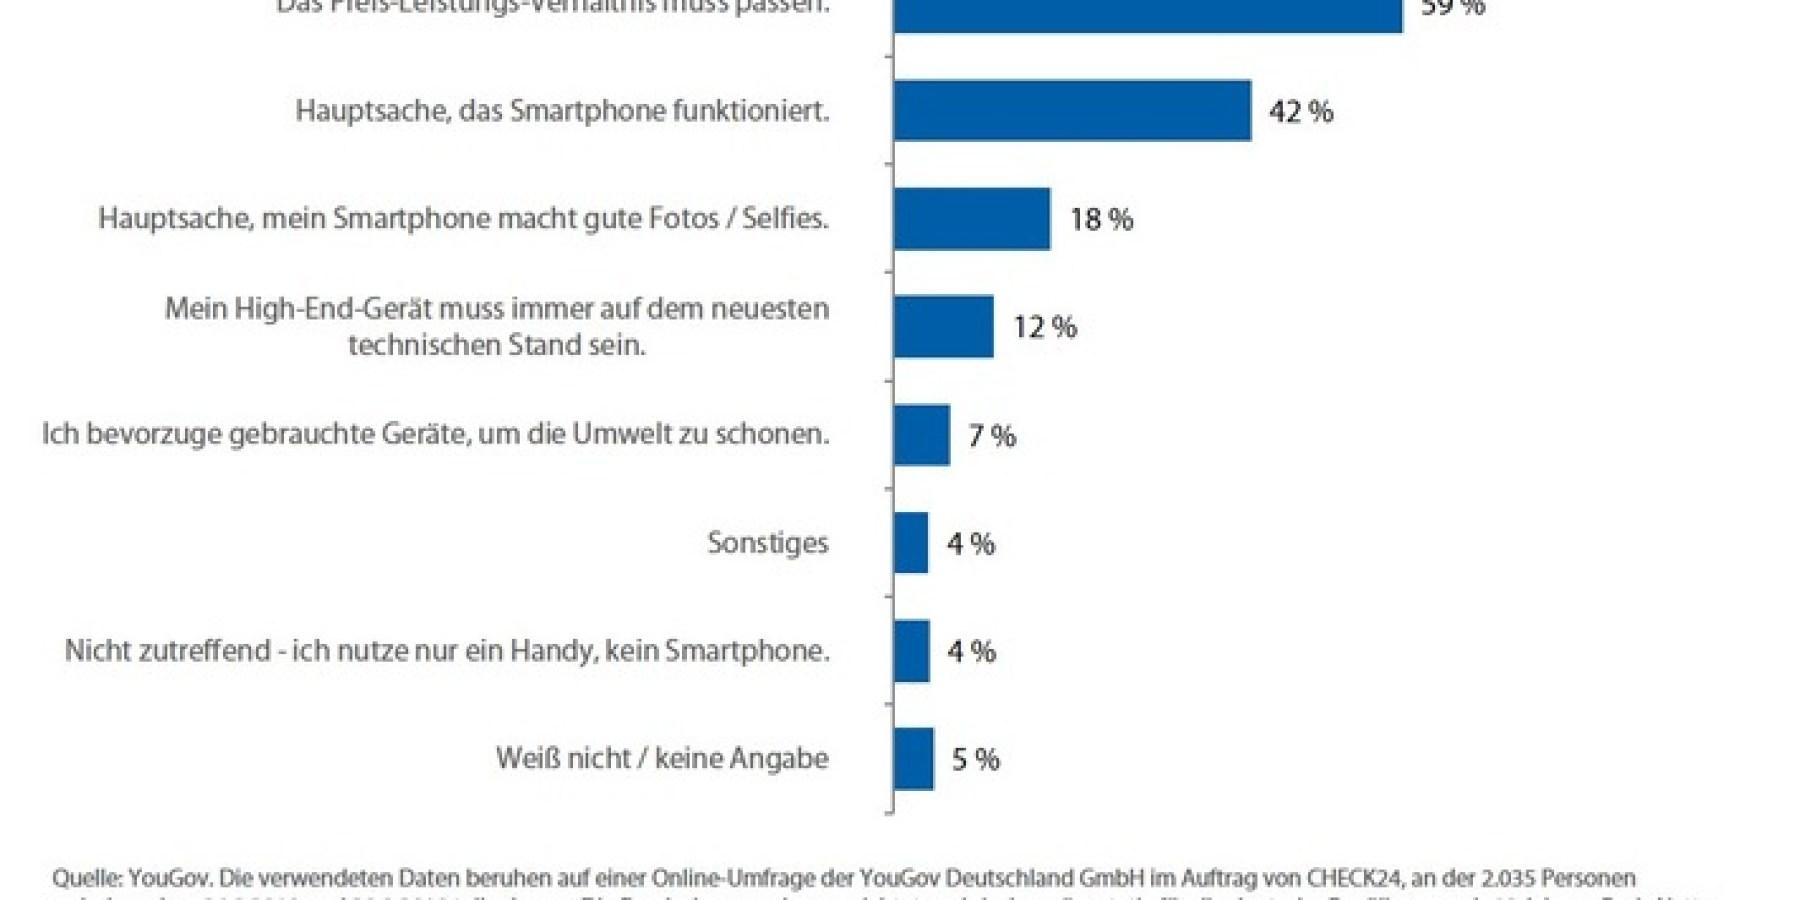 YouGov-Umfrage: Preis-Leistungs-Verhältnis bei Smartphones